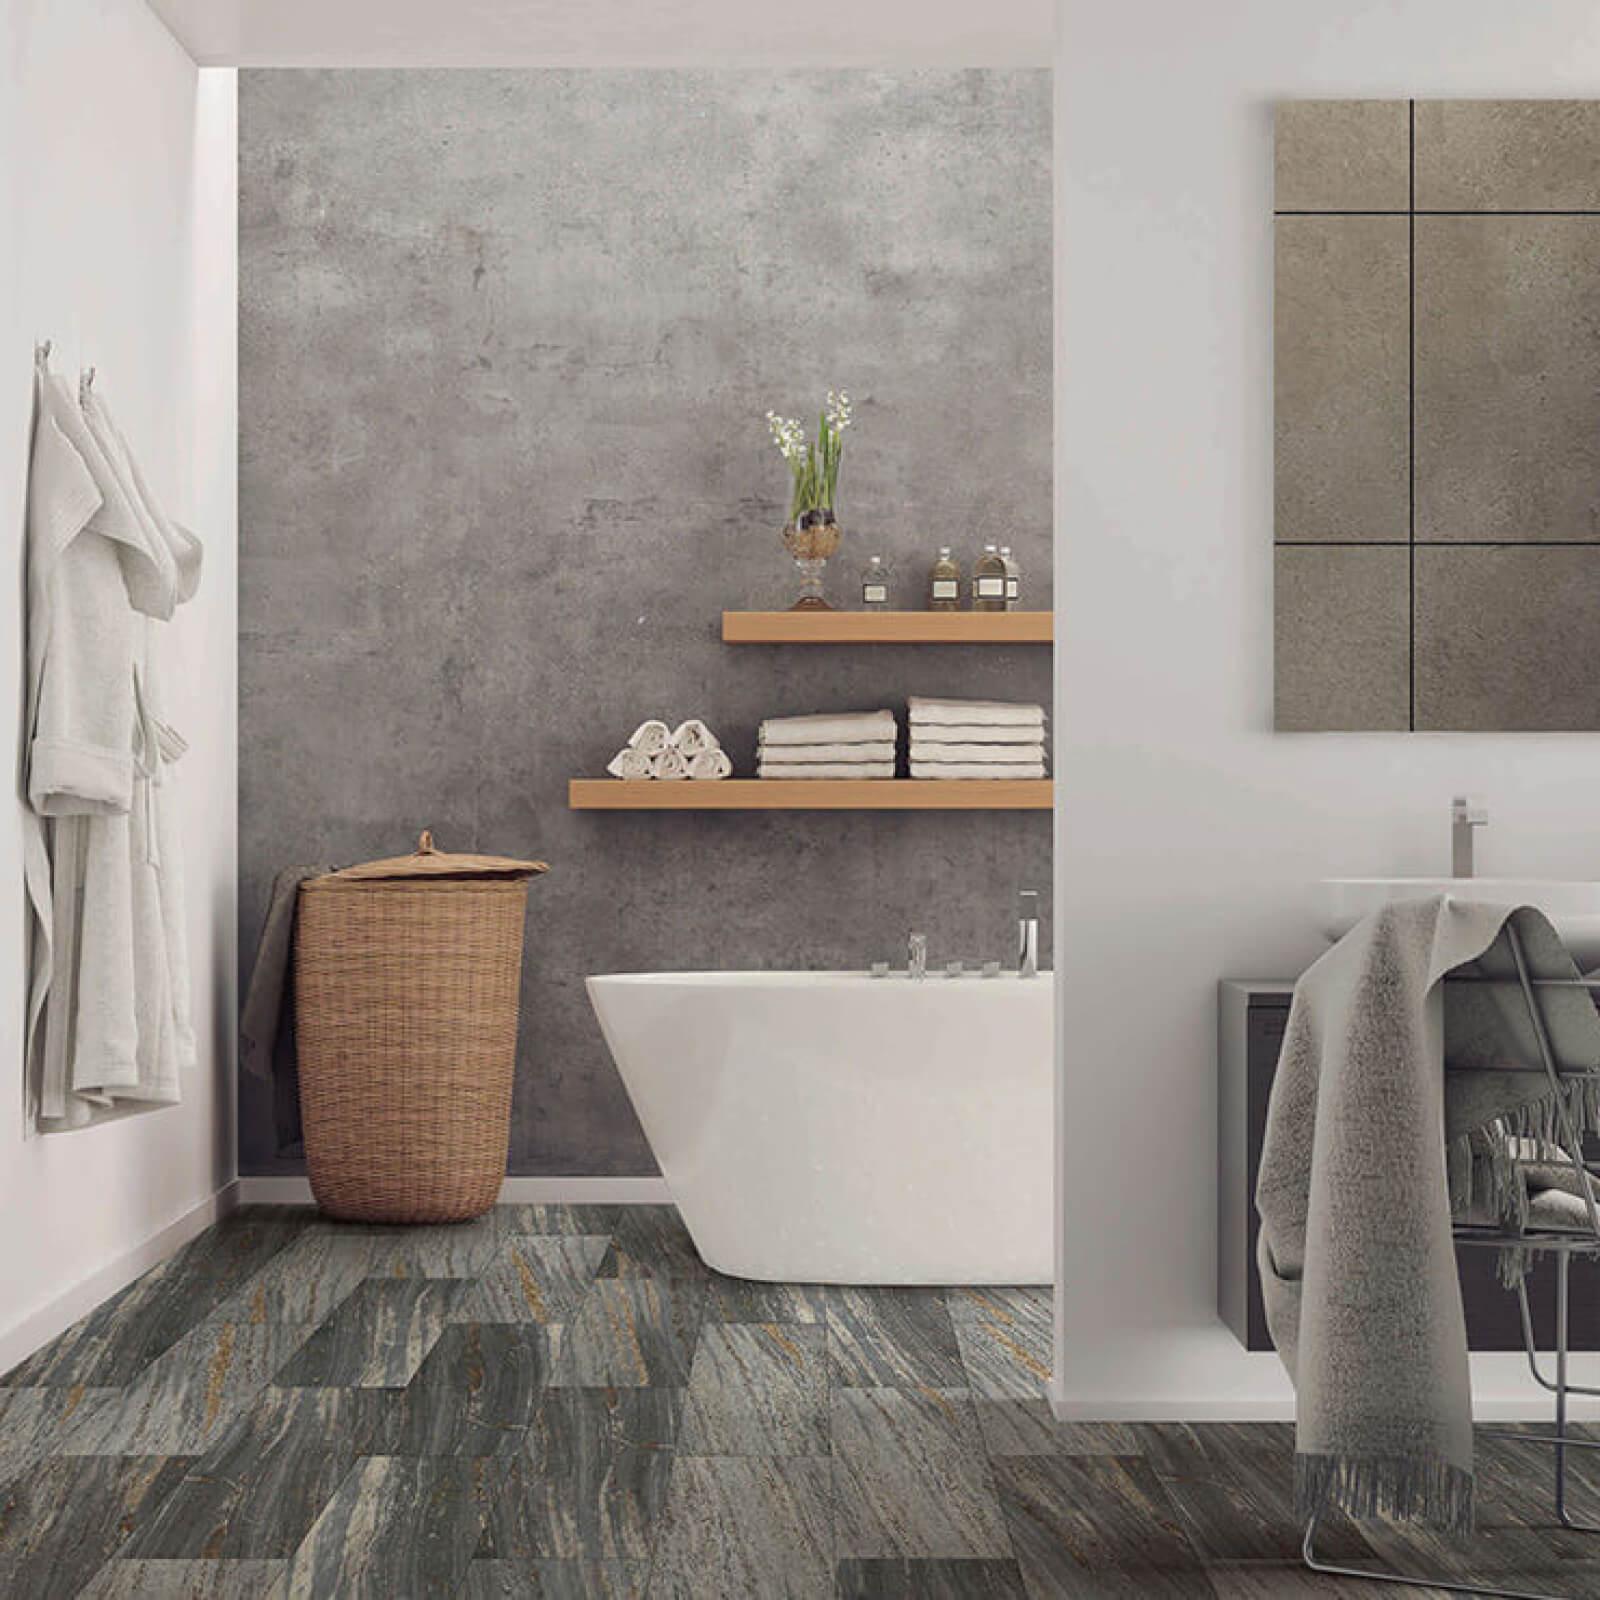 coetec vinyl flooring in bathroom | Dolphin Carpet & Tile